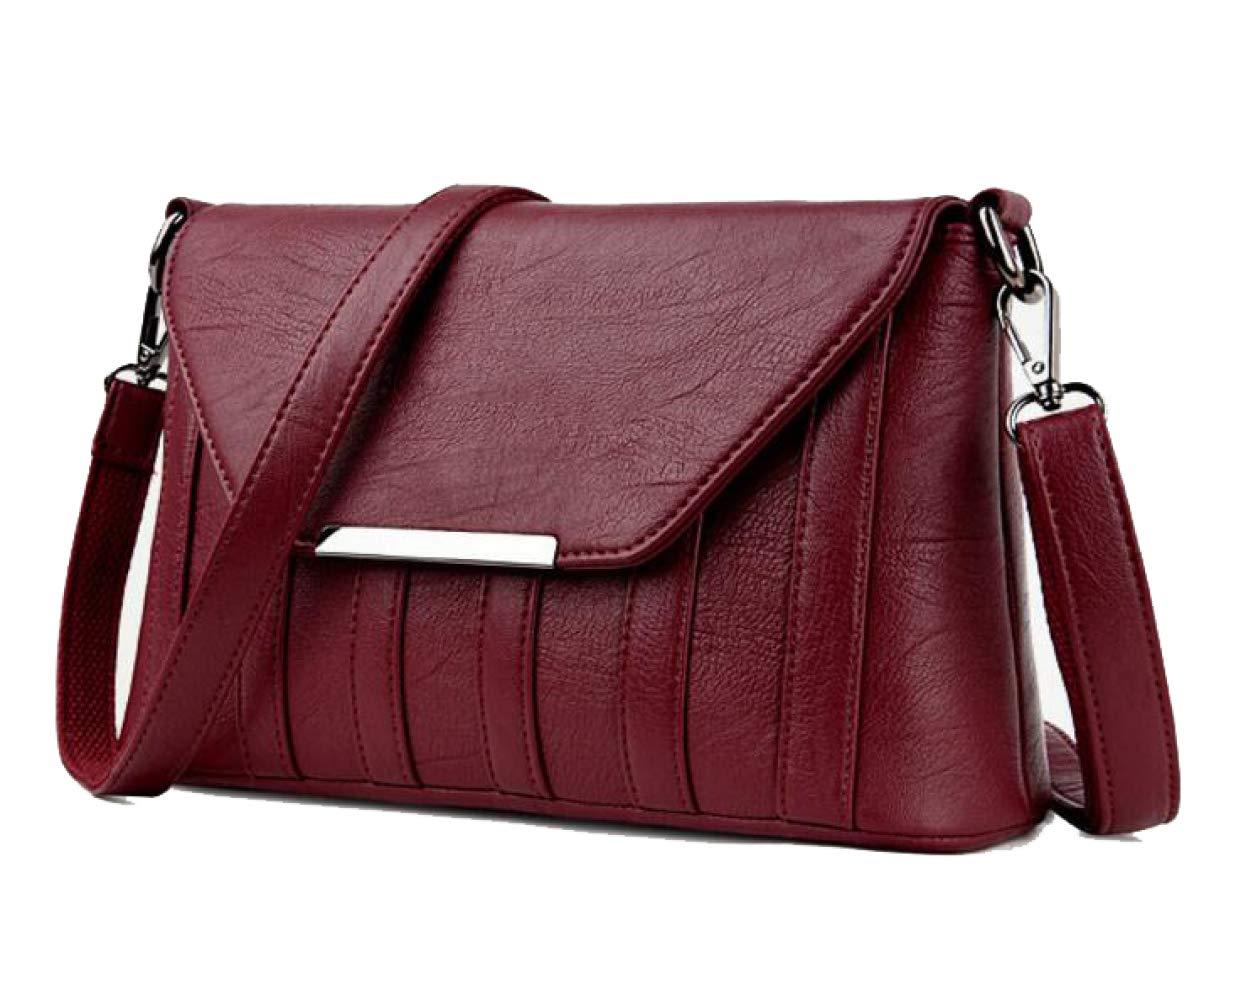 Handtasche Frau Schulter Diagonal Bag Bag Bag Fashion PU Handtasche 30  10  18,rot-OneGröße B07J6N74FR Schultertaschen Mittlere Kosten dd1d65